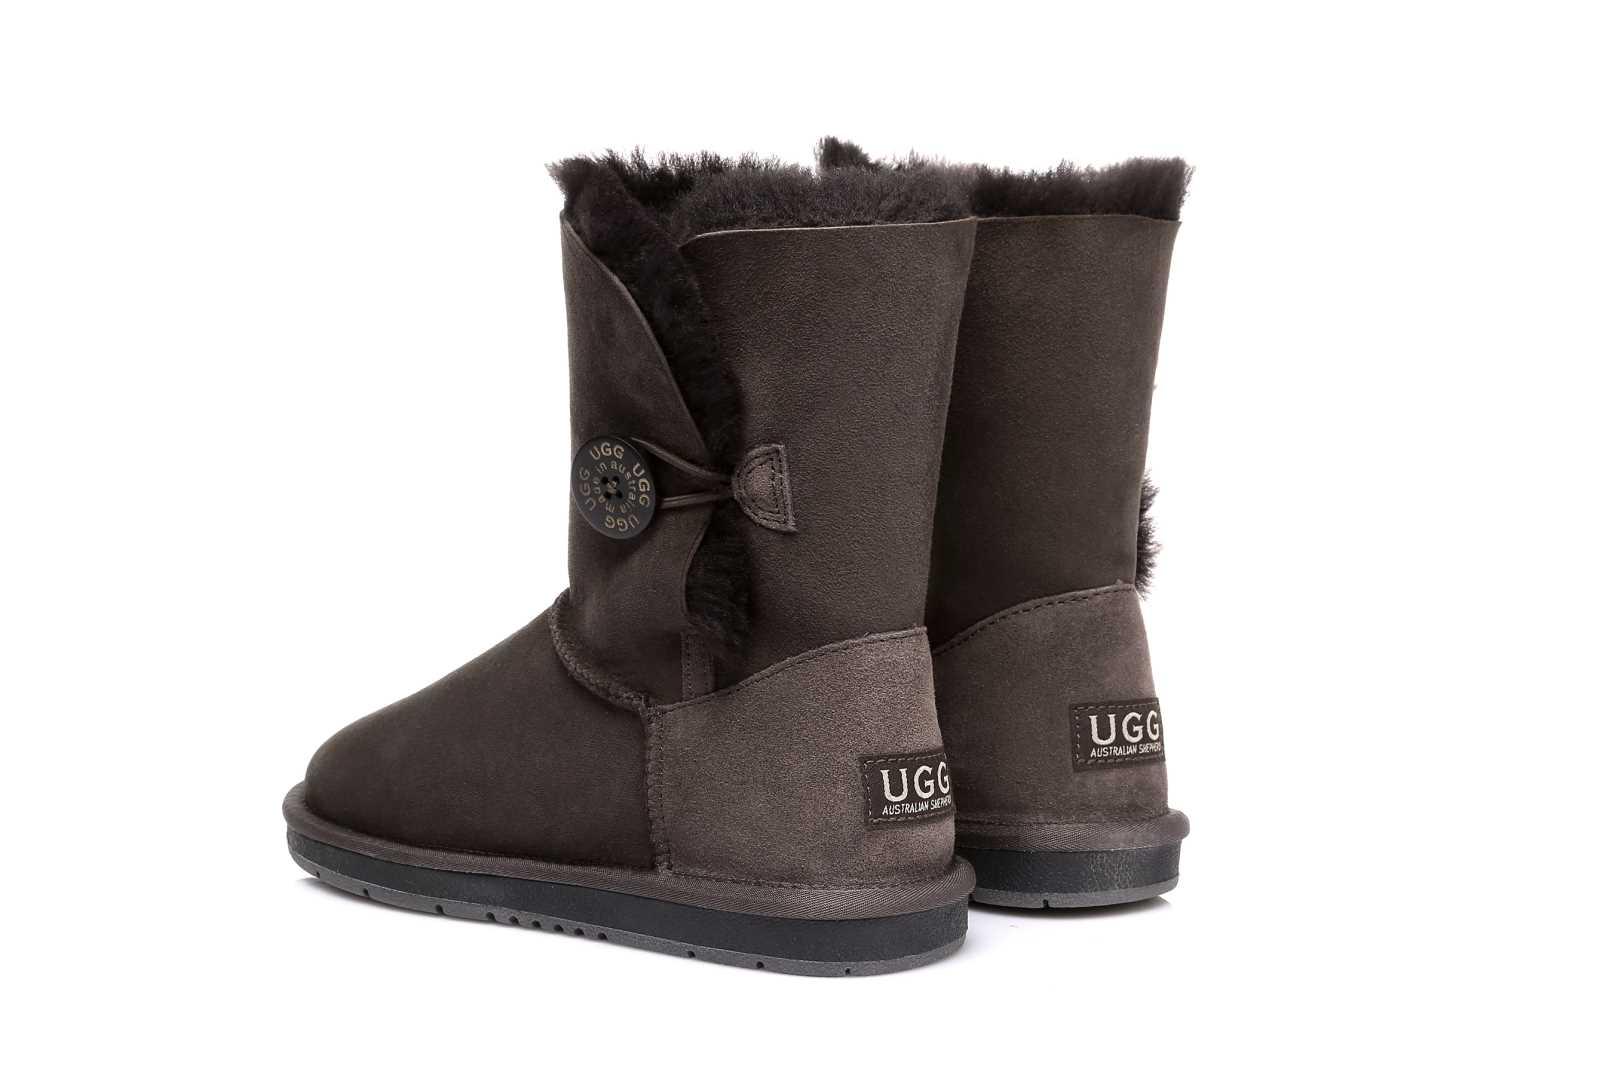 1101b12095 UGG Ladies Short Button Boots Australian Premium Sheepskin Water ...